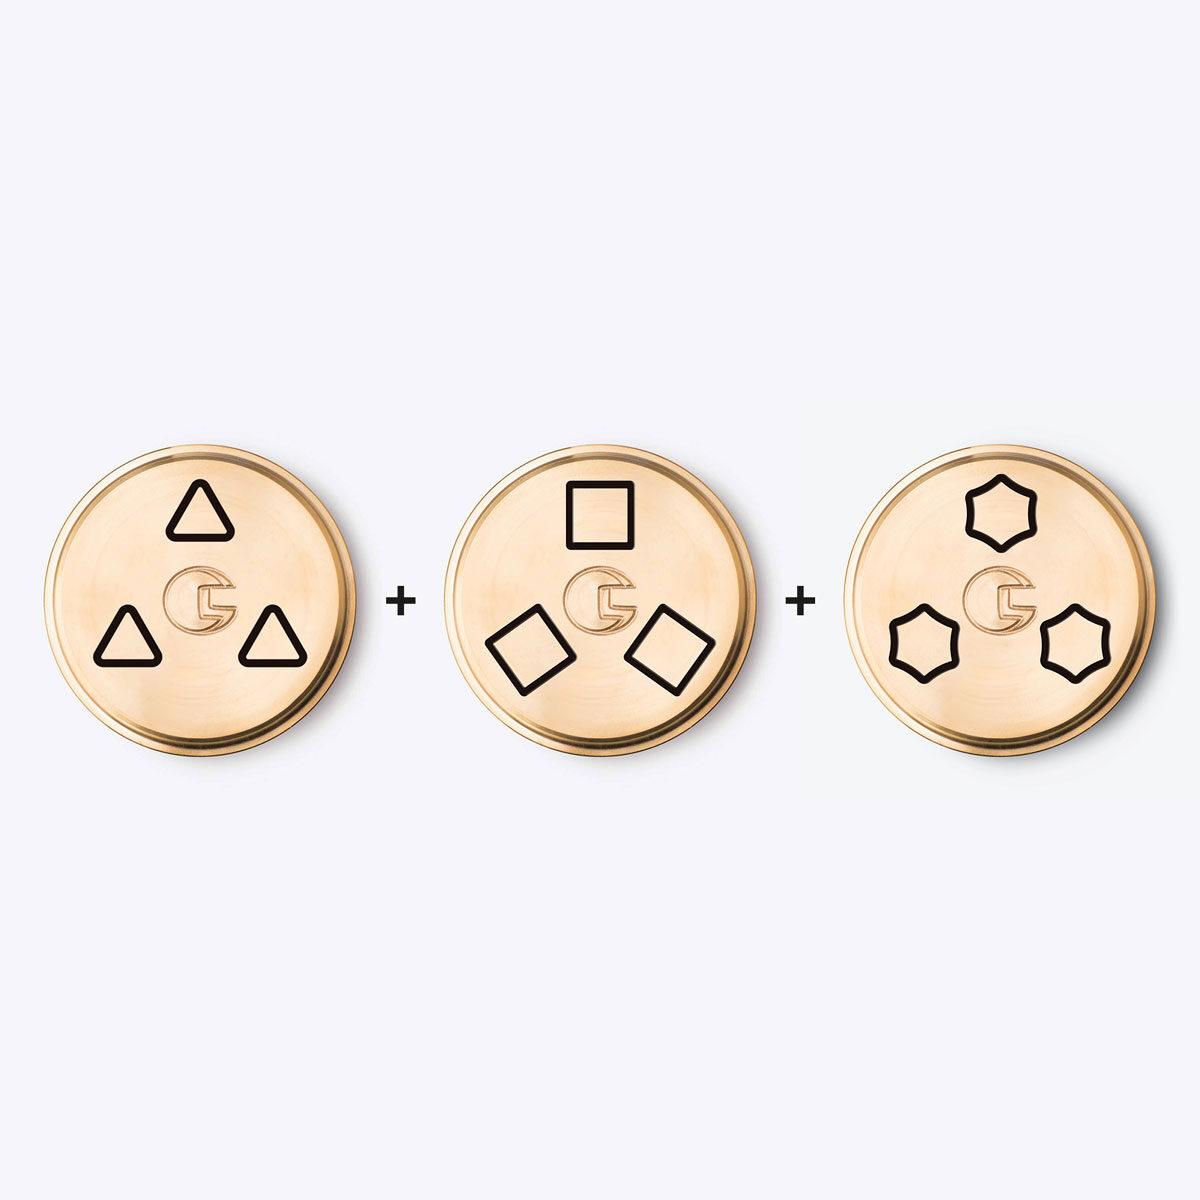 504-forme_geometriche_